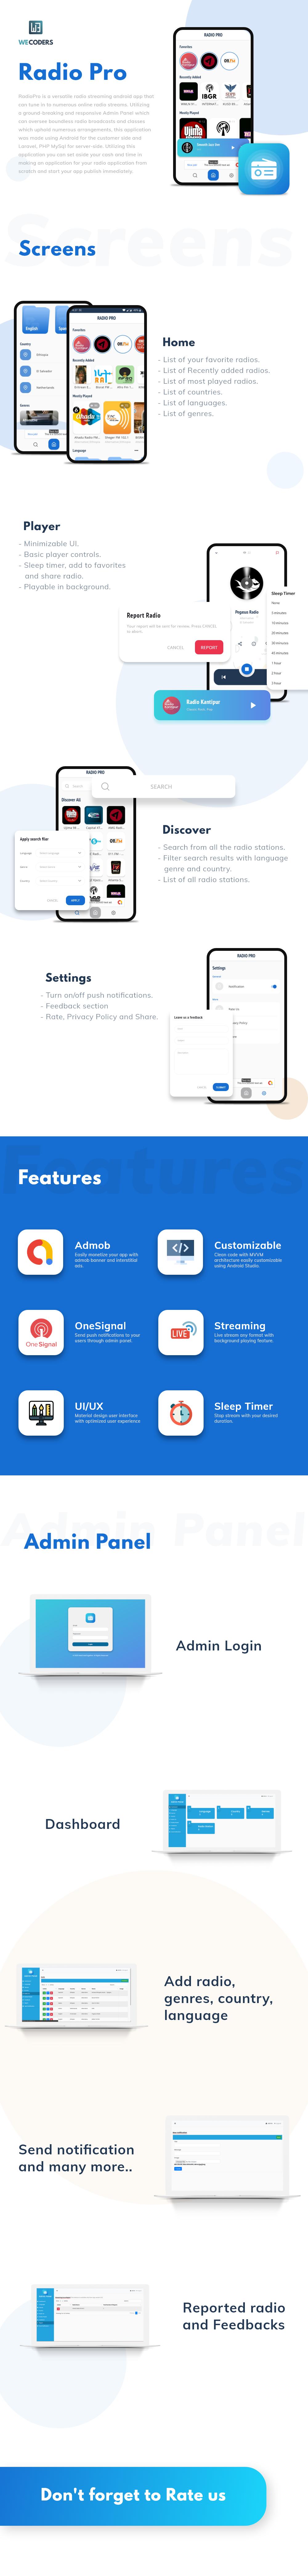 Radio Pro App